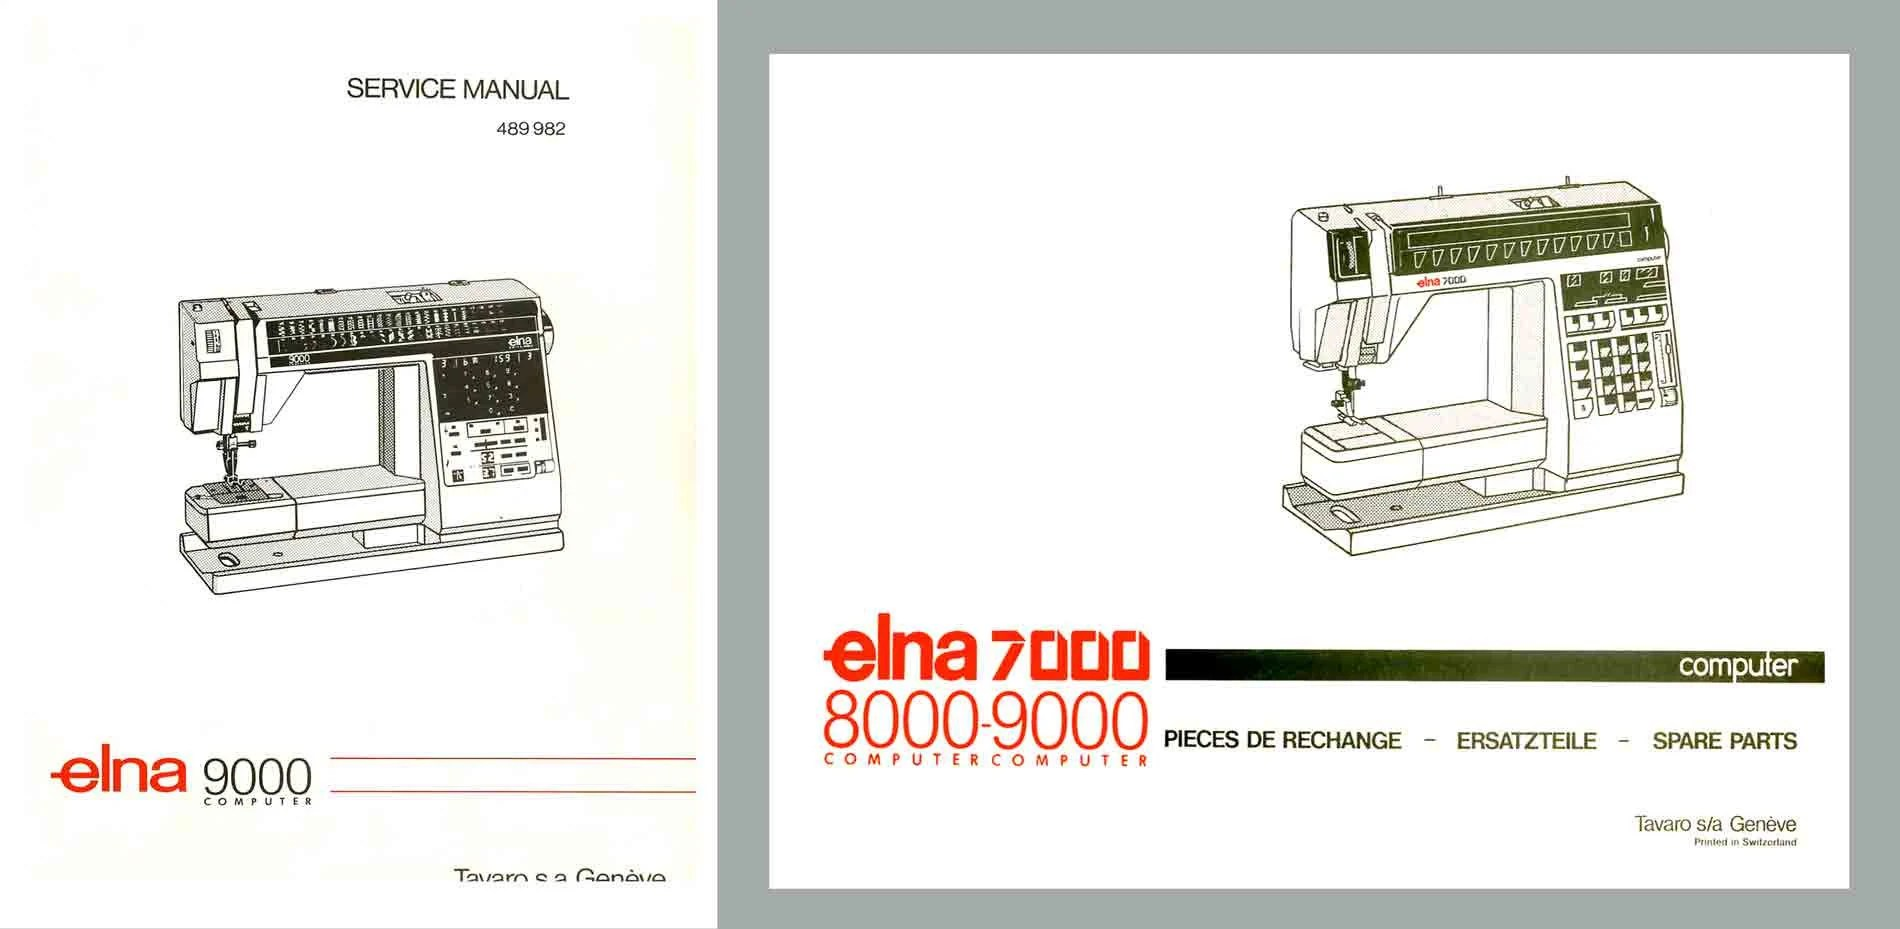 elna sewing machine parts diagram cat6a plug wiring 9000 diva service manual and schematics book etsy 50